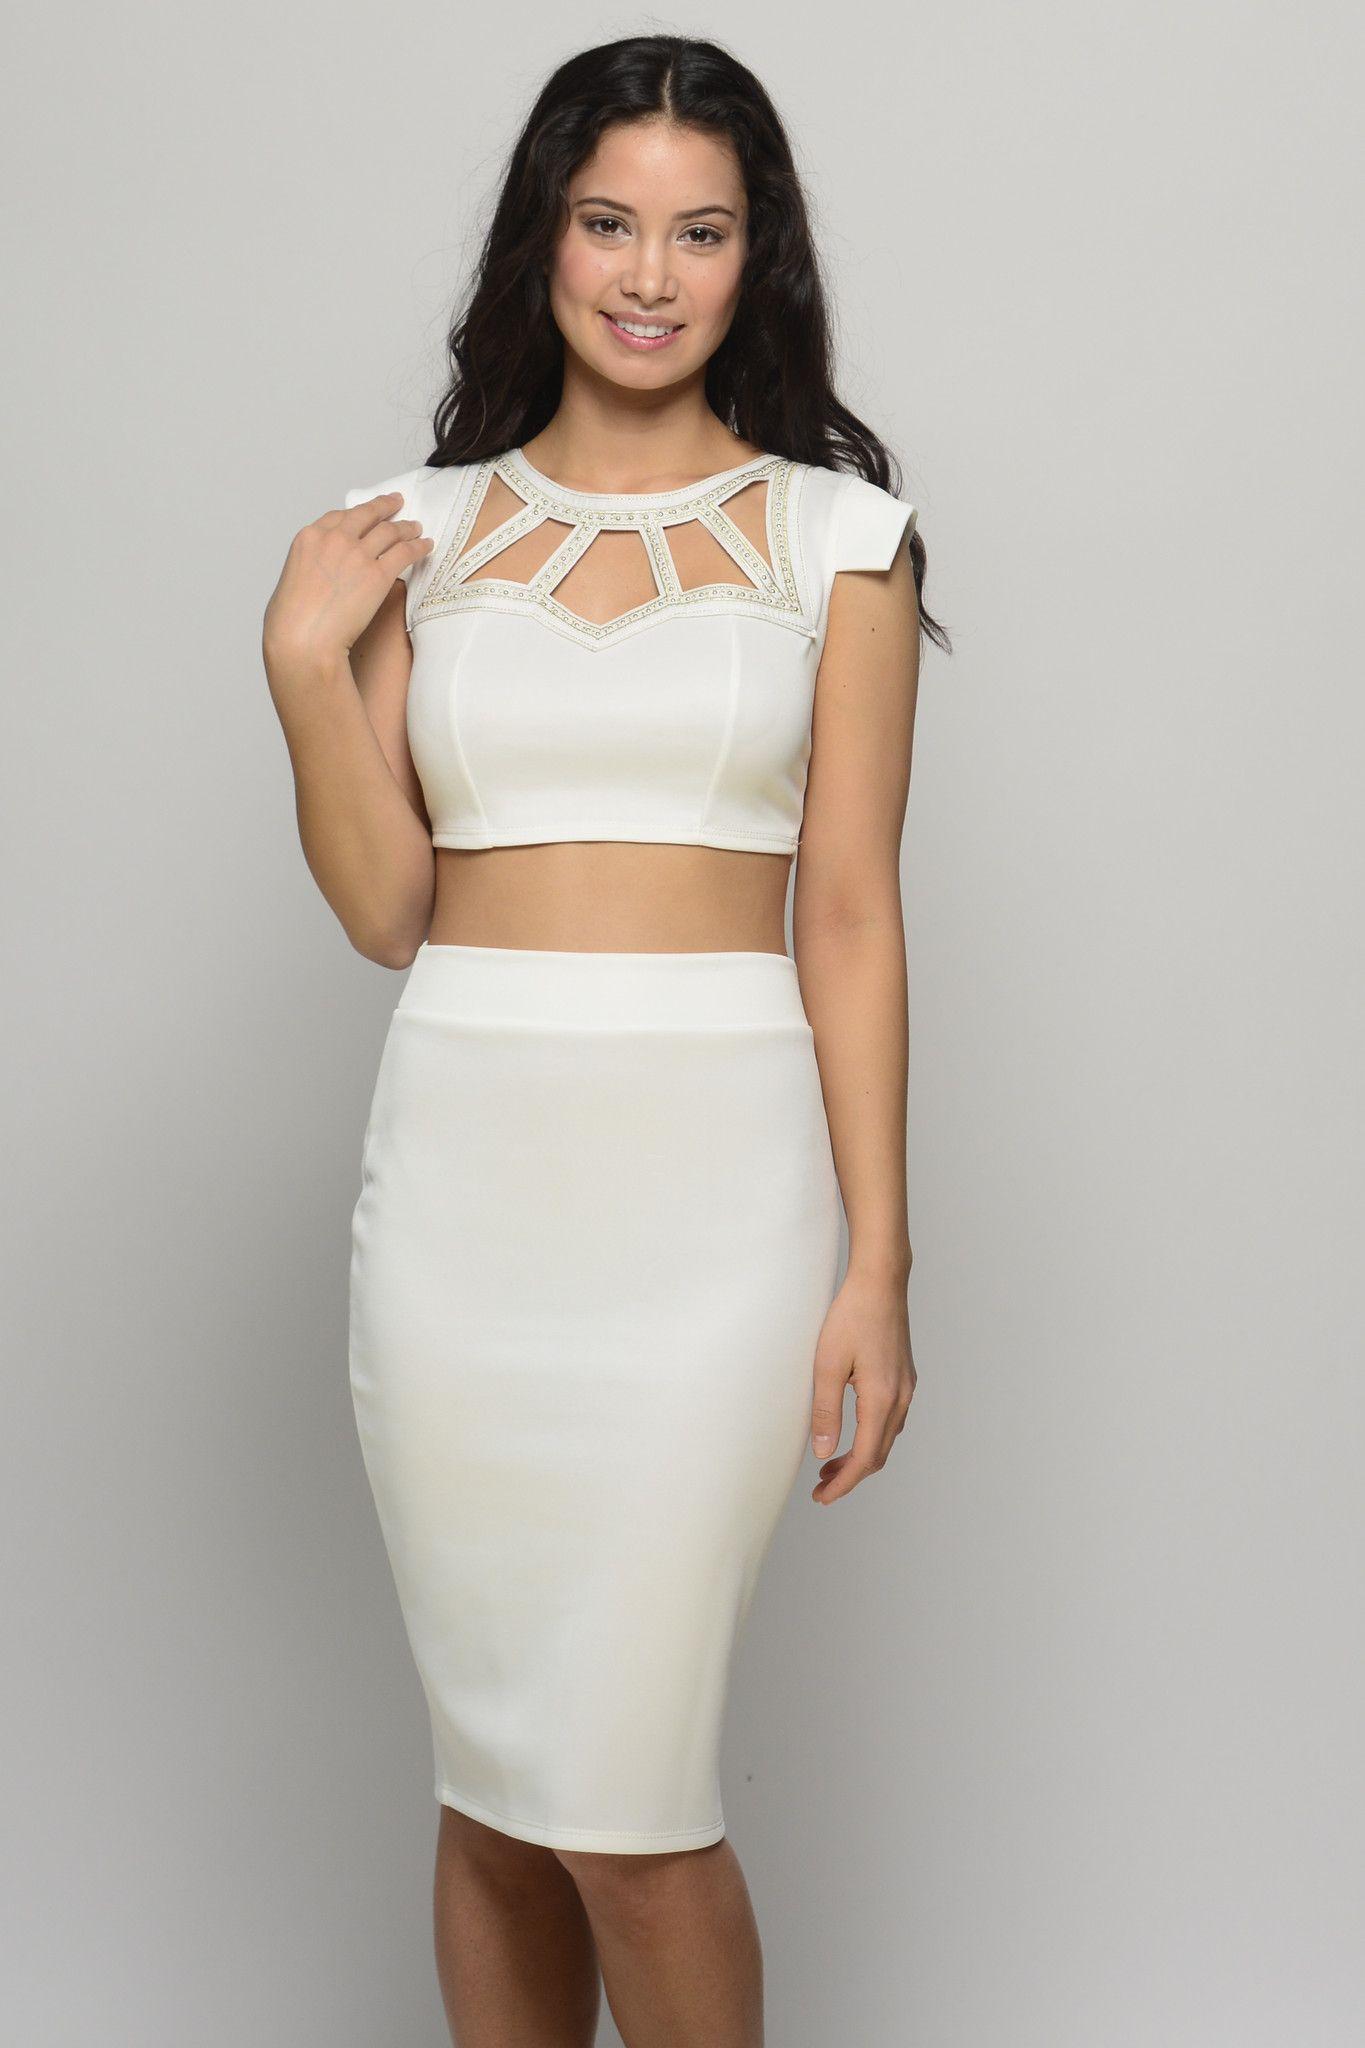 Signature Bliss White 2 Piece Set Night Out Dress Vegas Dresses Dresses [ 2048 x 1365 Pixel ]